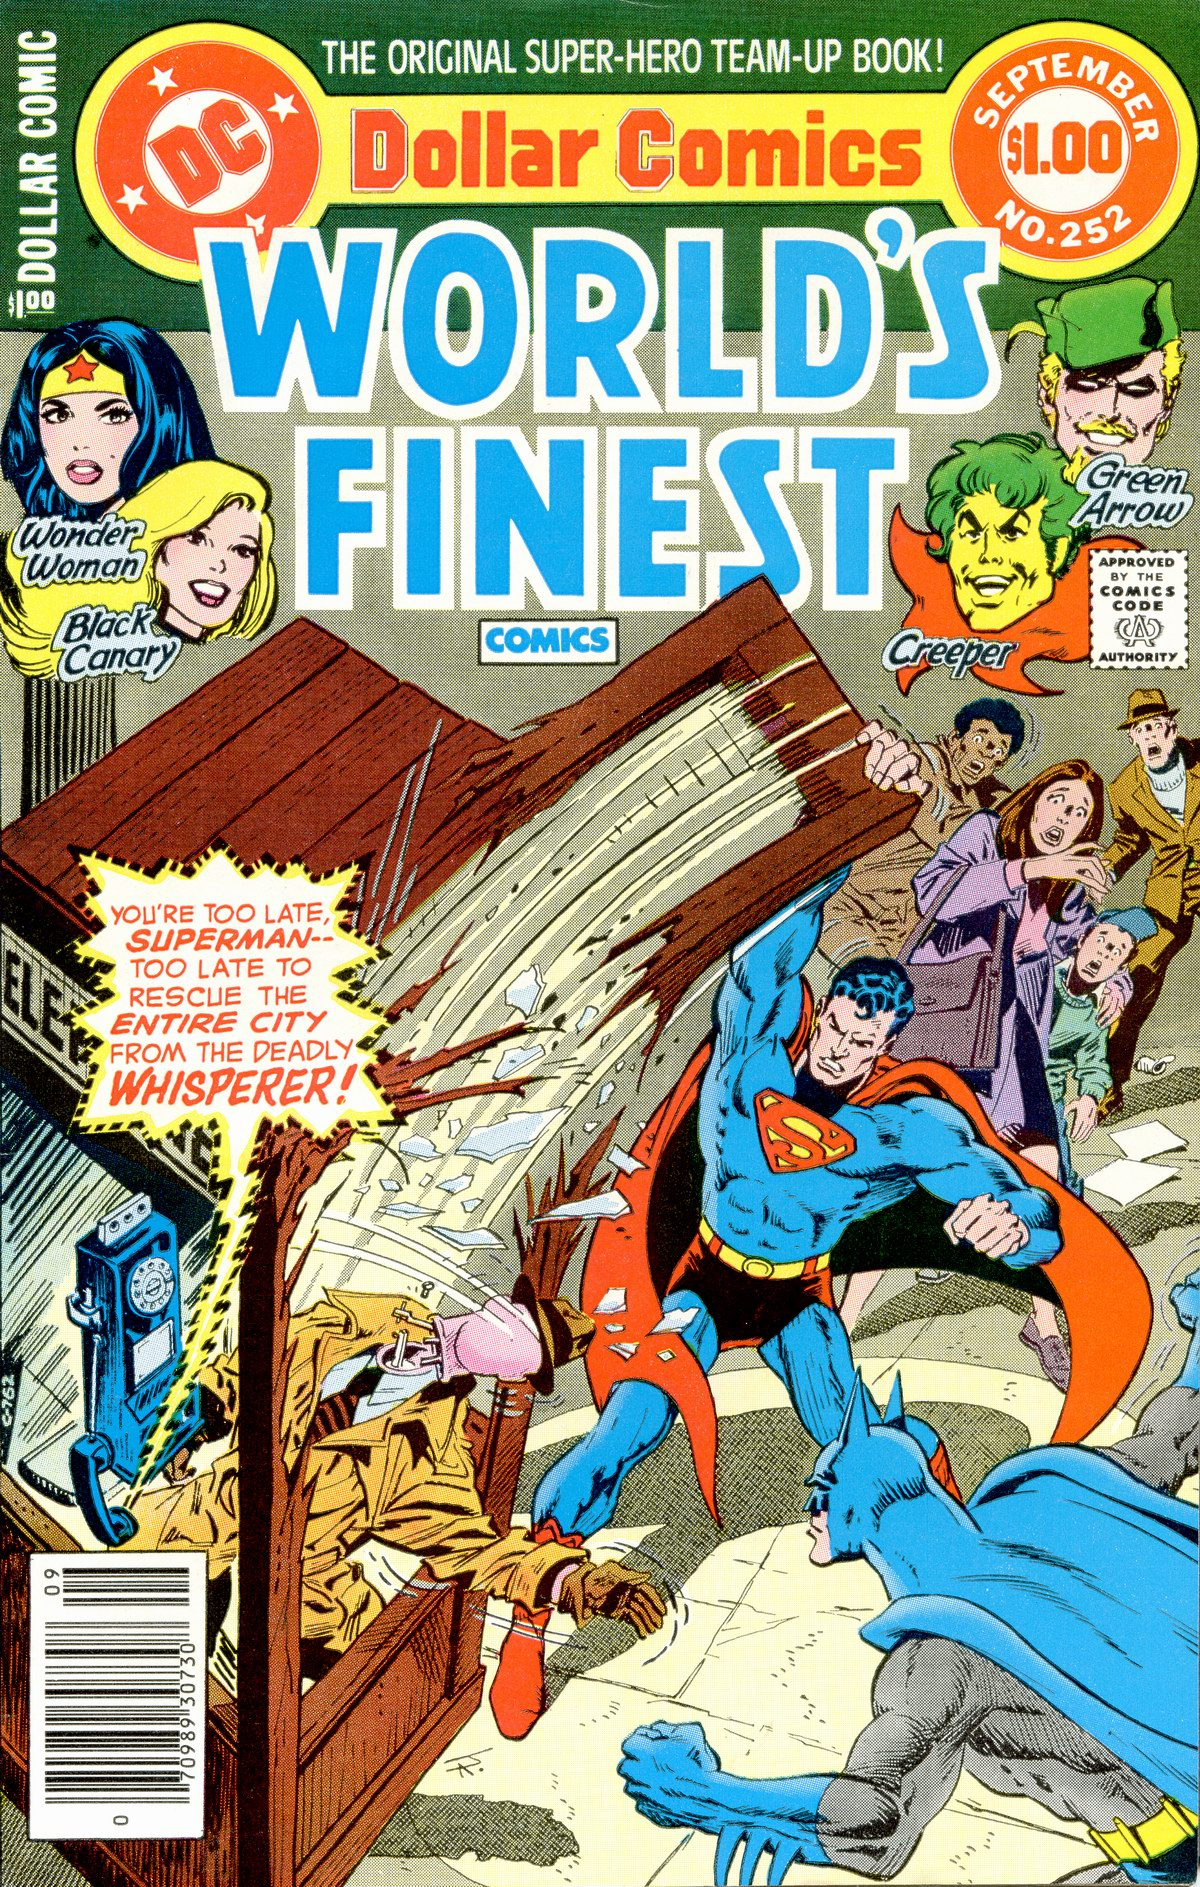 Read online World's Finest Comics comic -  Issue #252 - 1